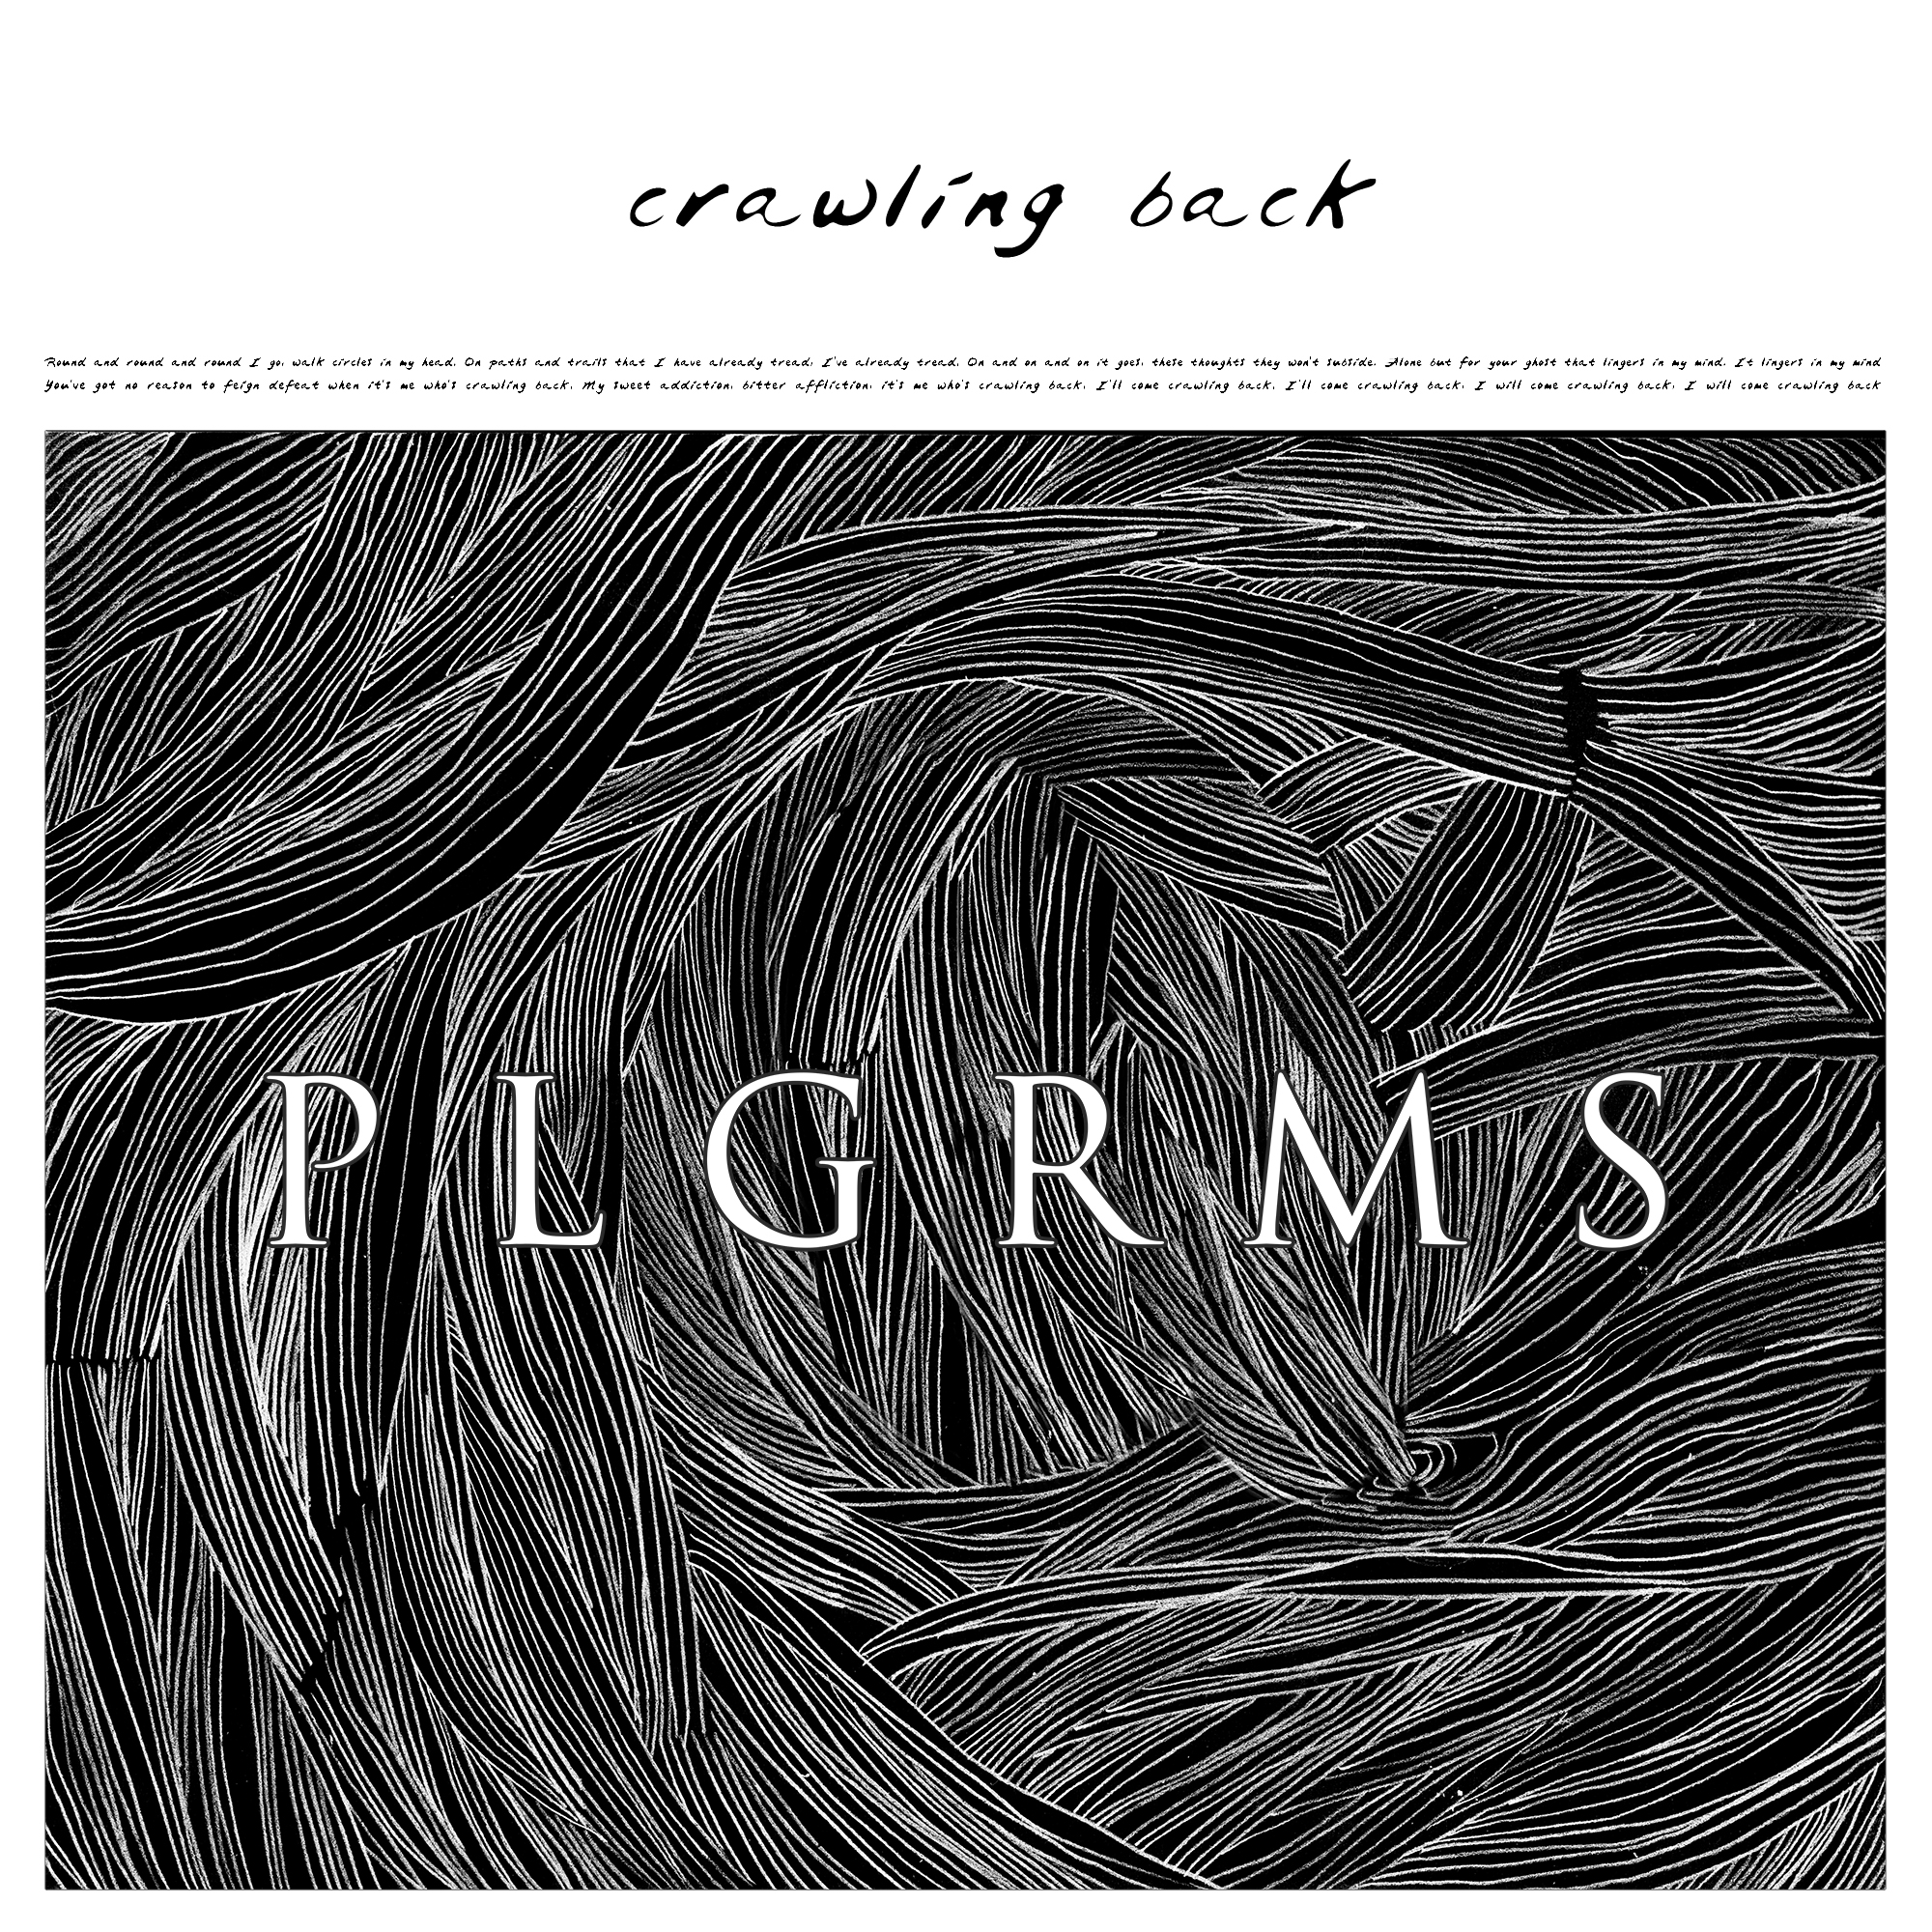 PLGRMS - Crawling Back